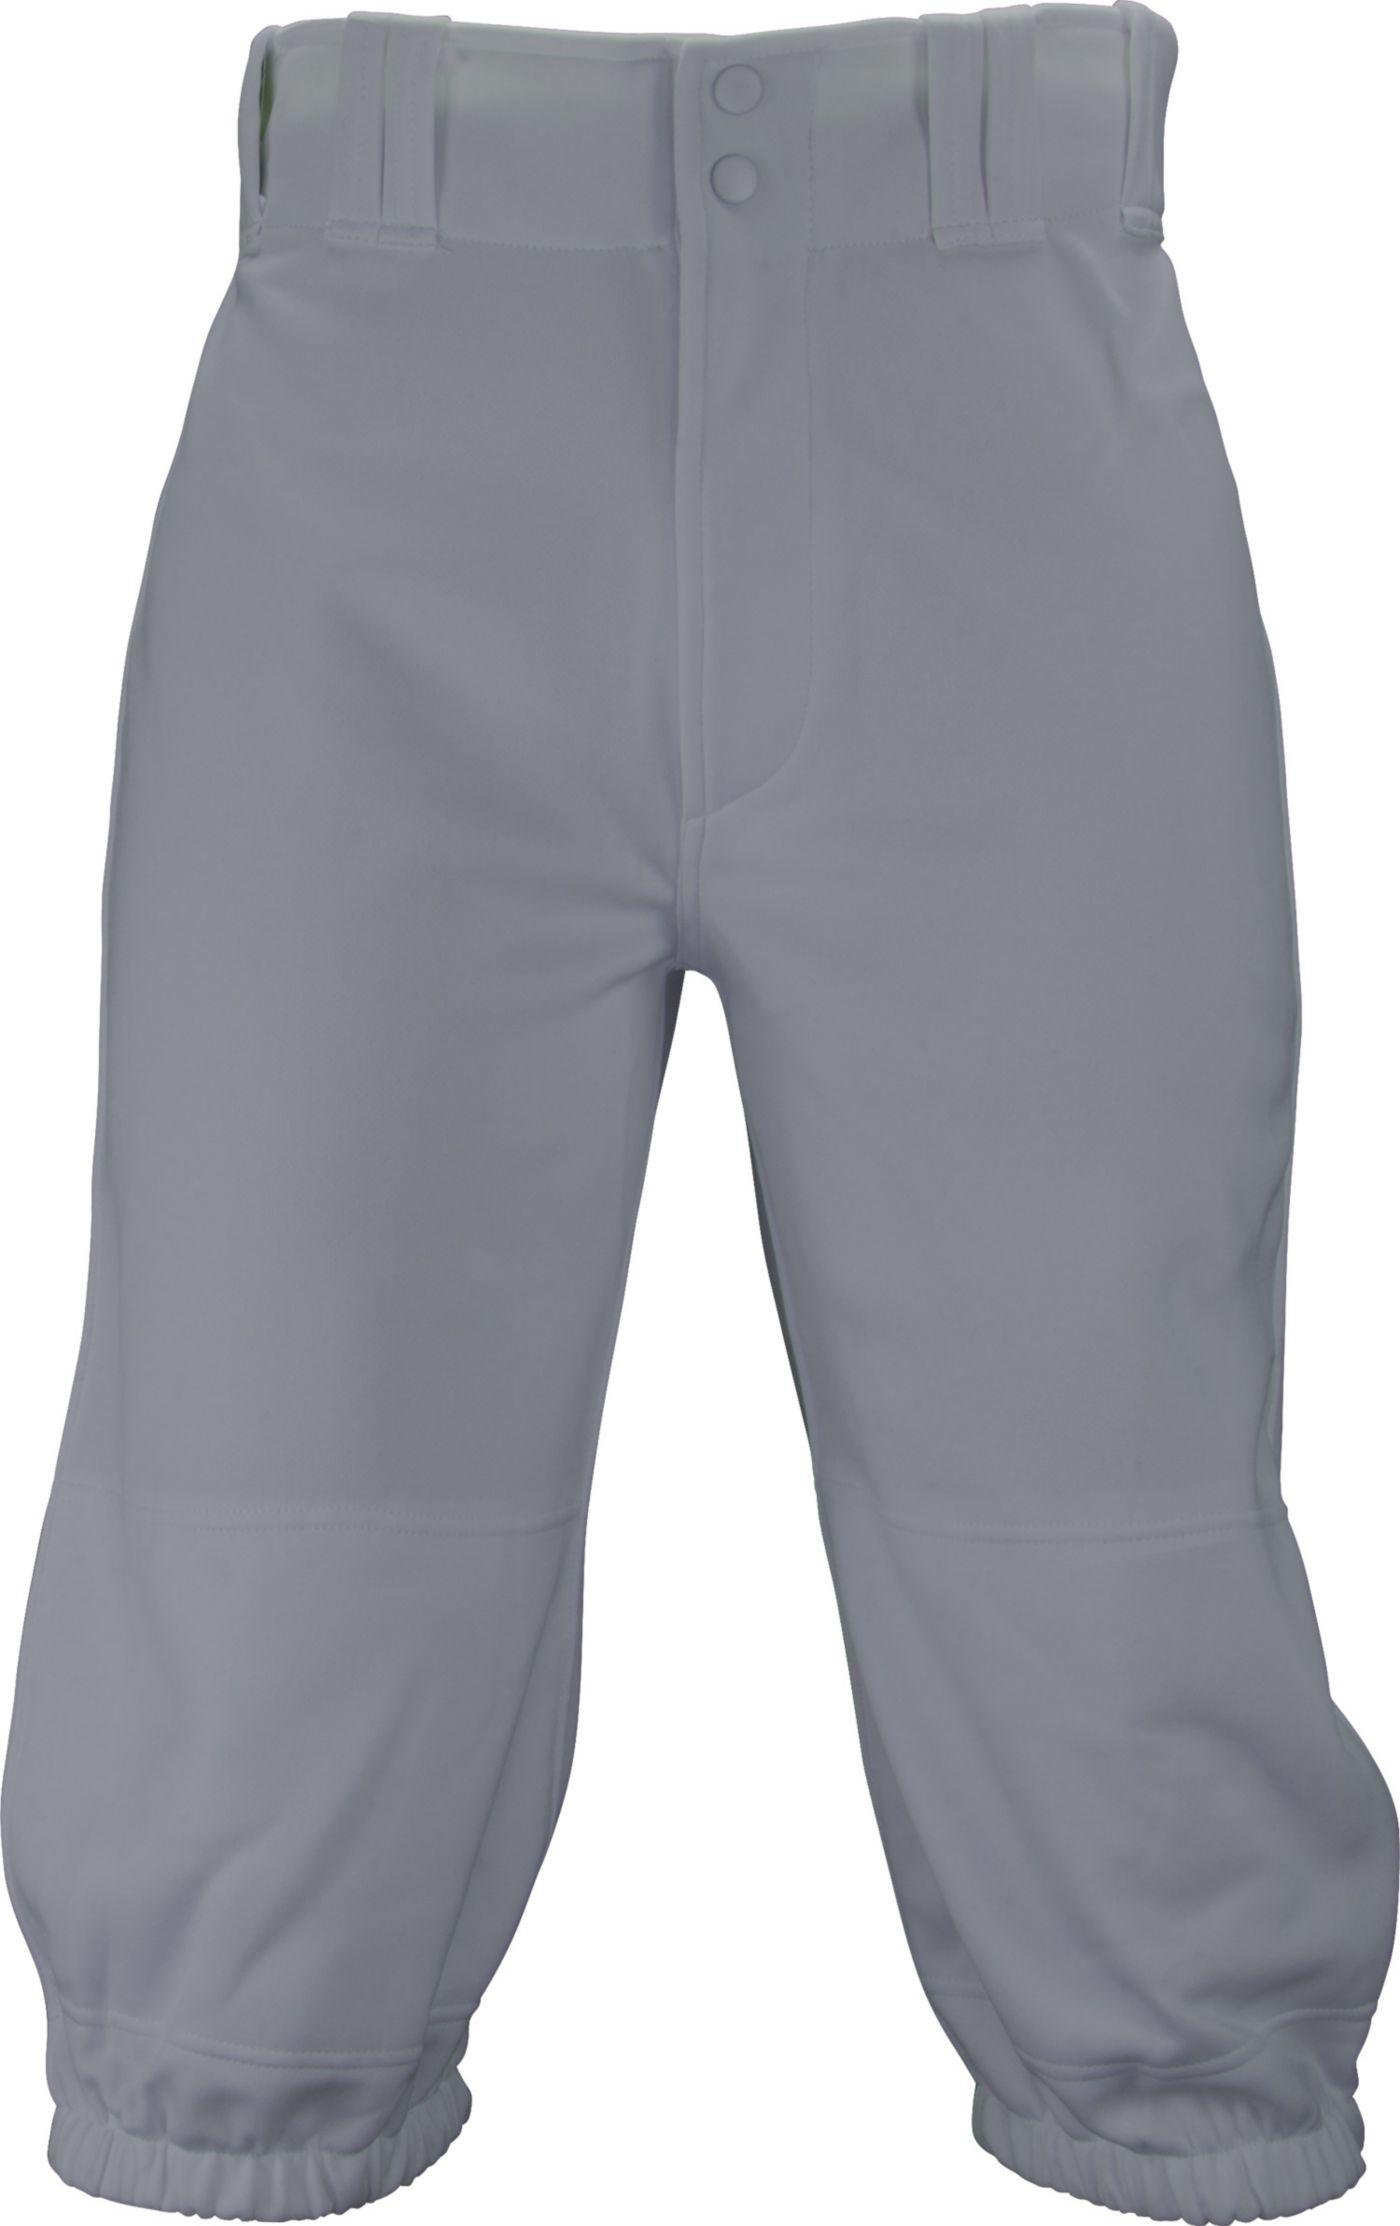 Marucci Men's Double Knit Short Baseball Pants